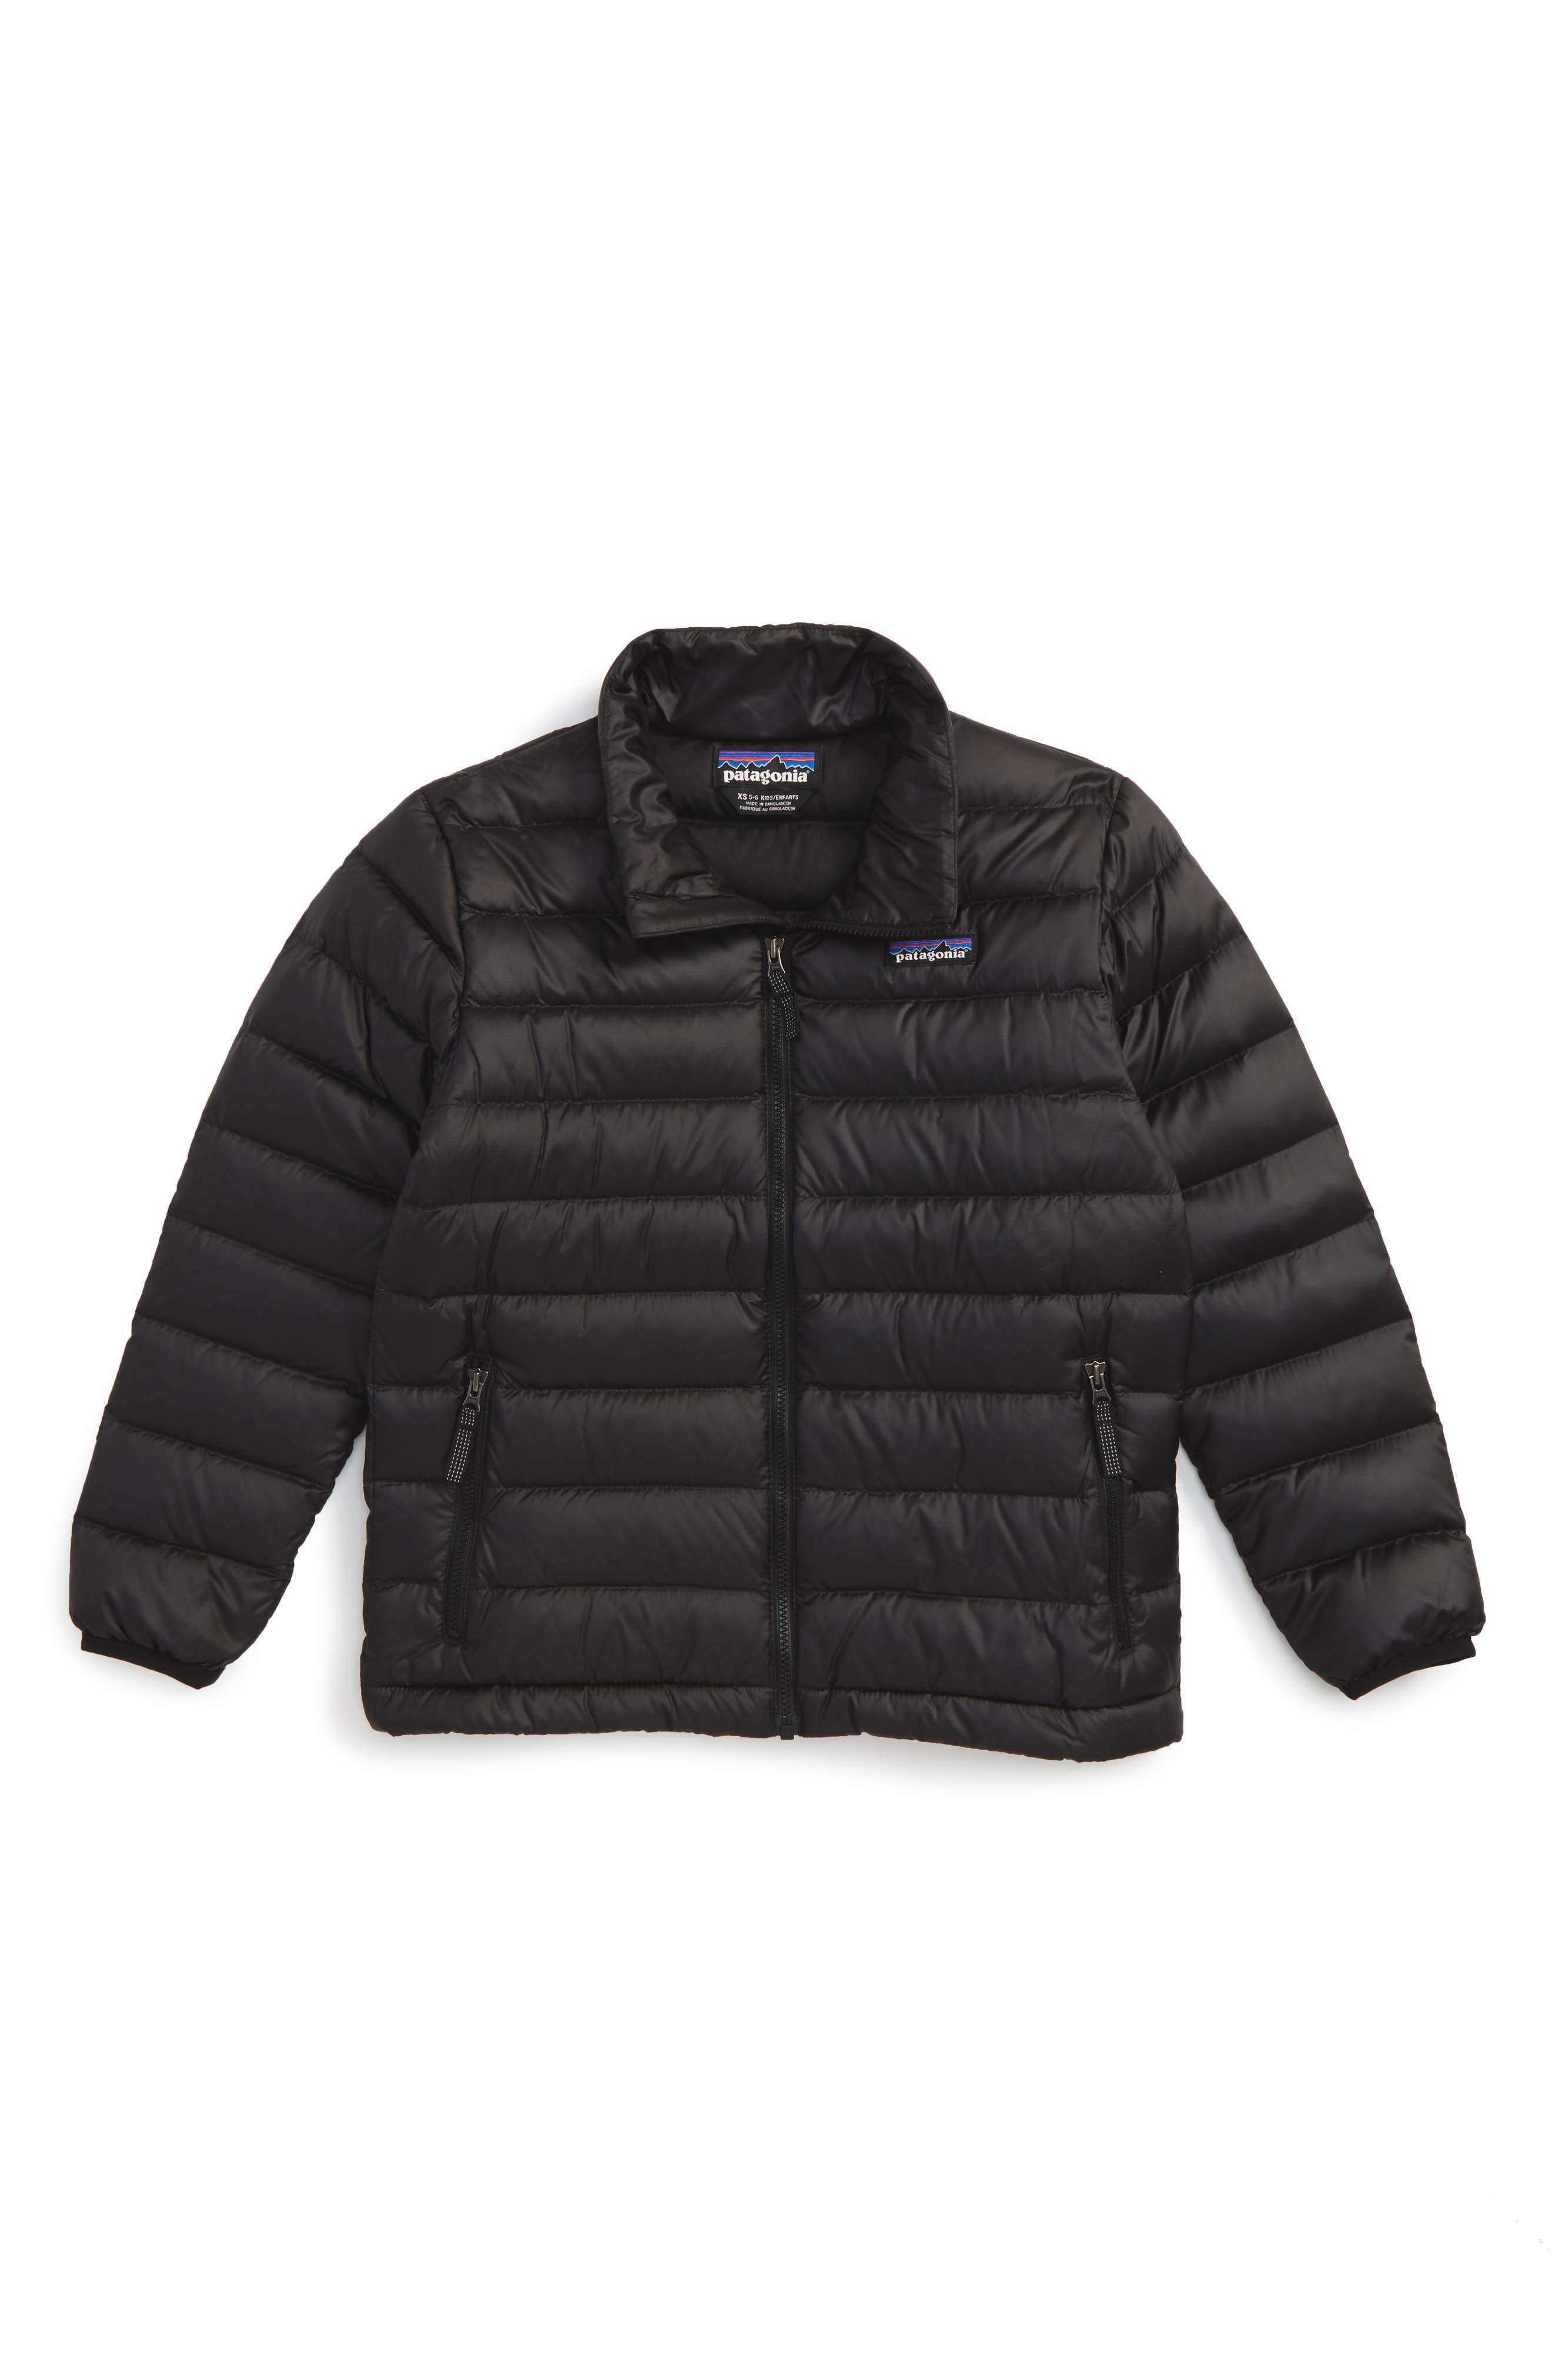 Alternate Image 1 Selected - Patagonia Down Sweater Jacket (Little Boys & Big Boys)